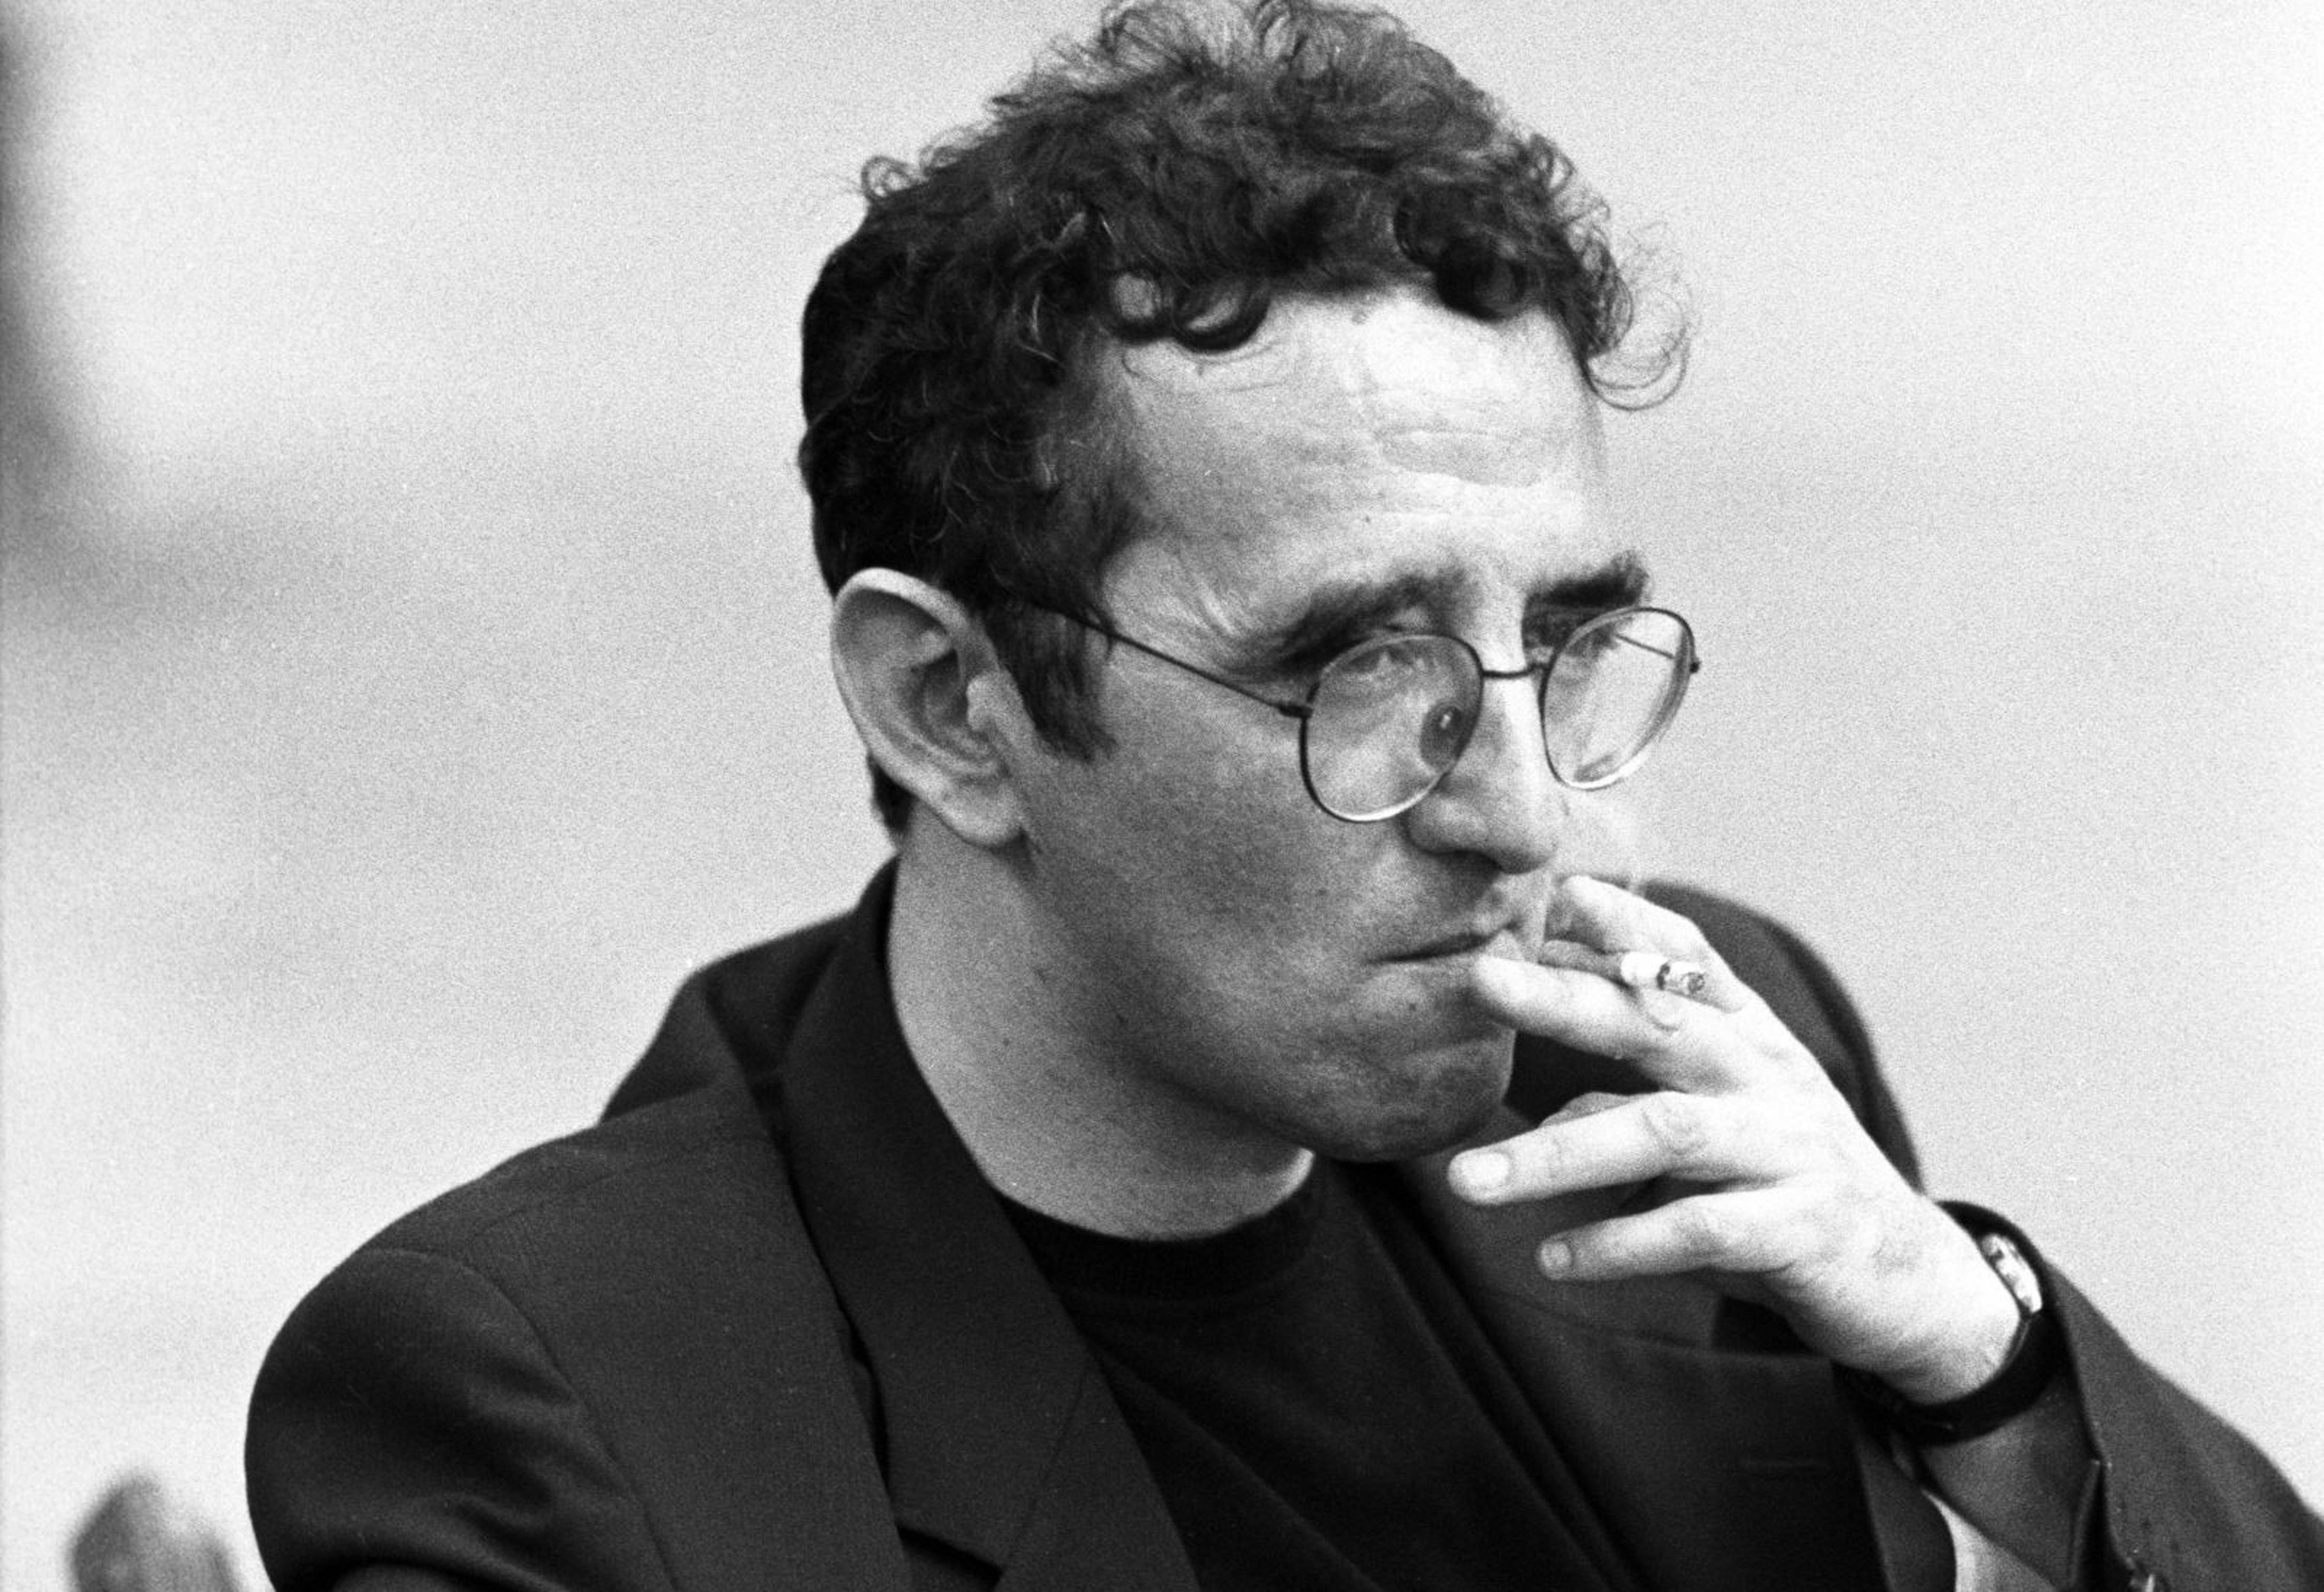 Roberto Bolaño expõe a hipocrisia dos homens das letras que utilizam a literatura como exercício de poder